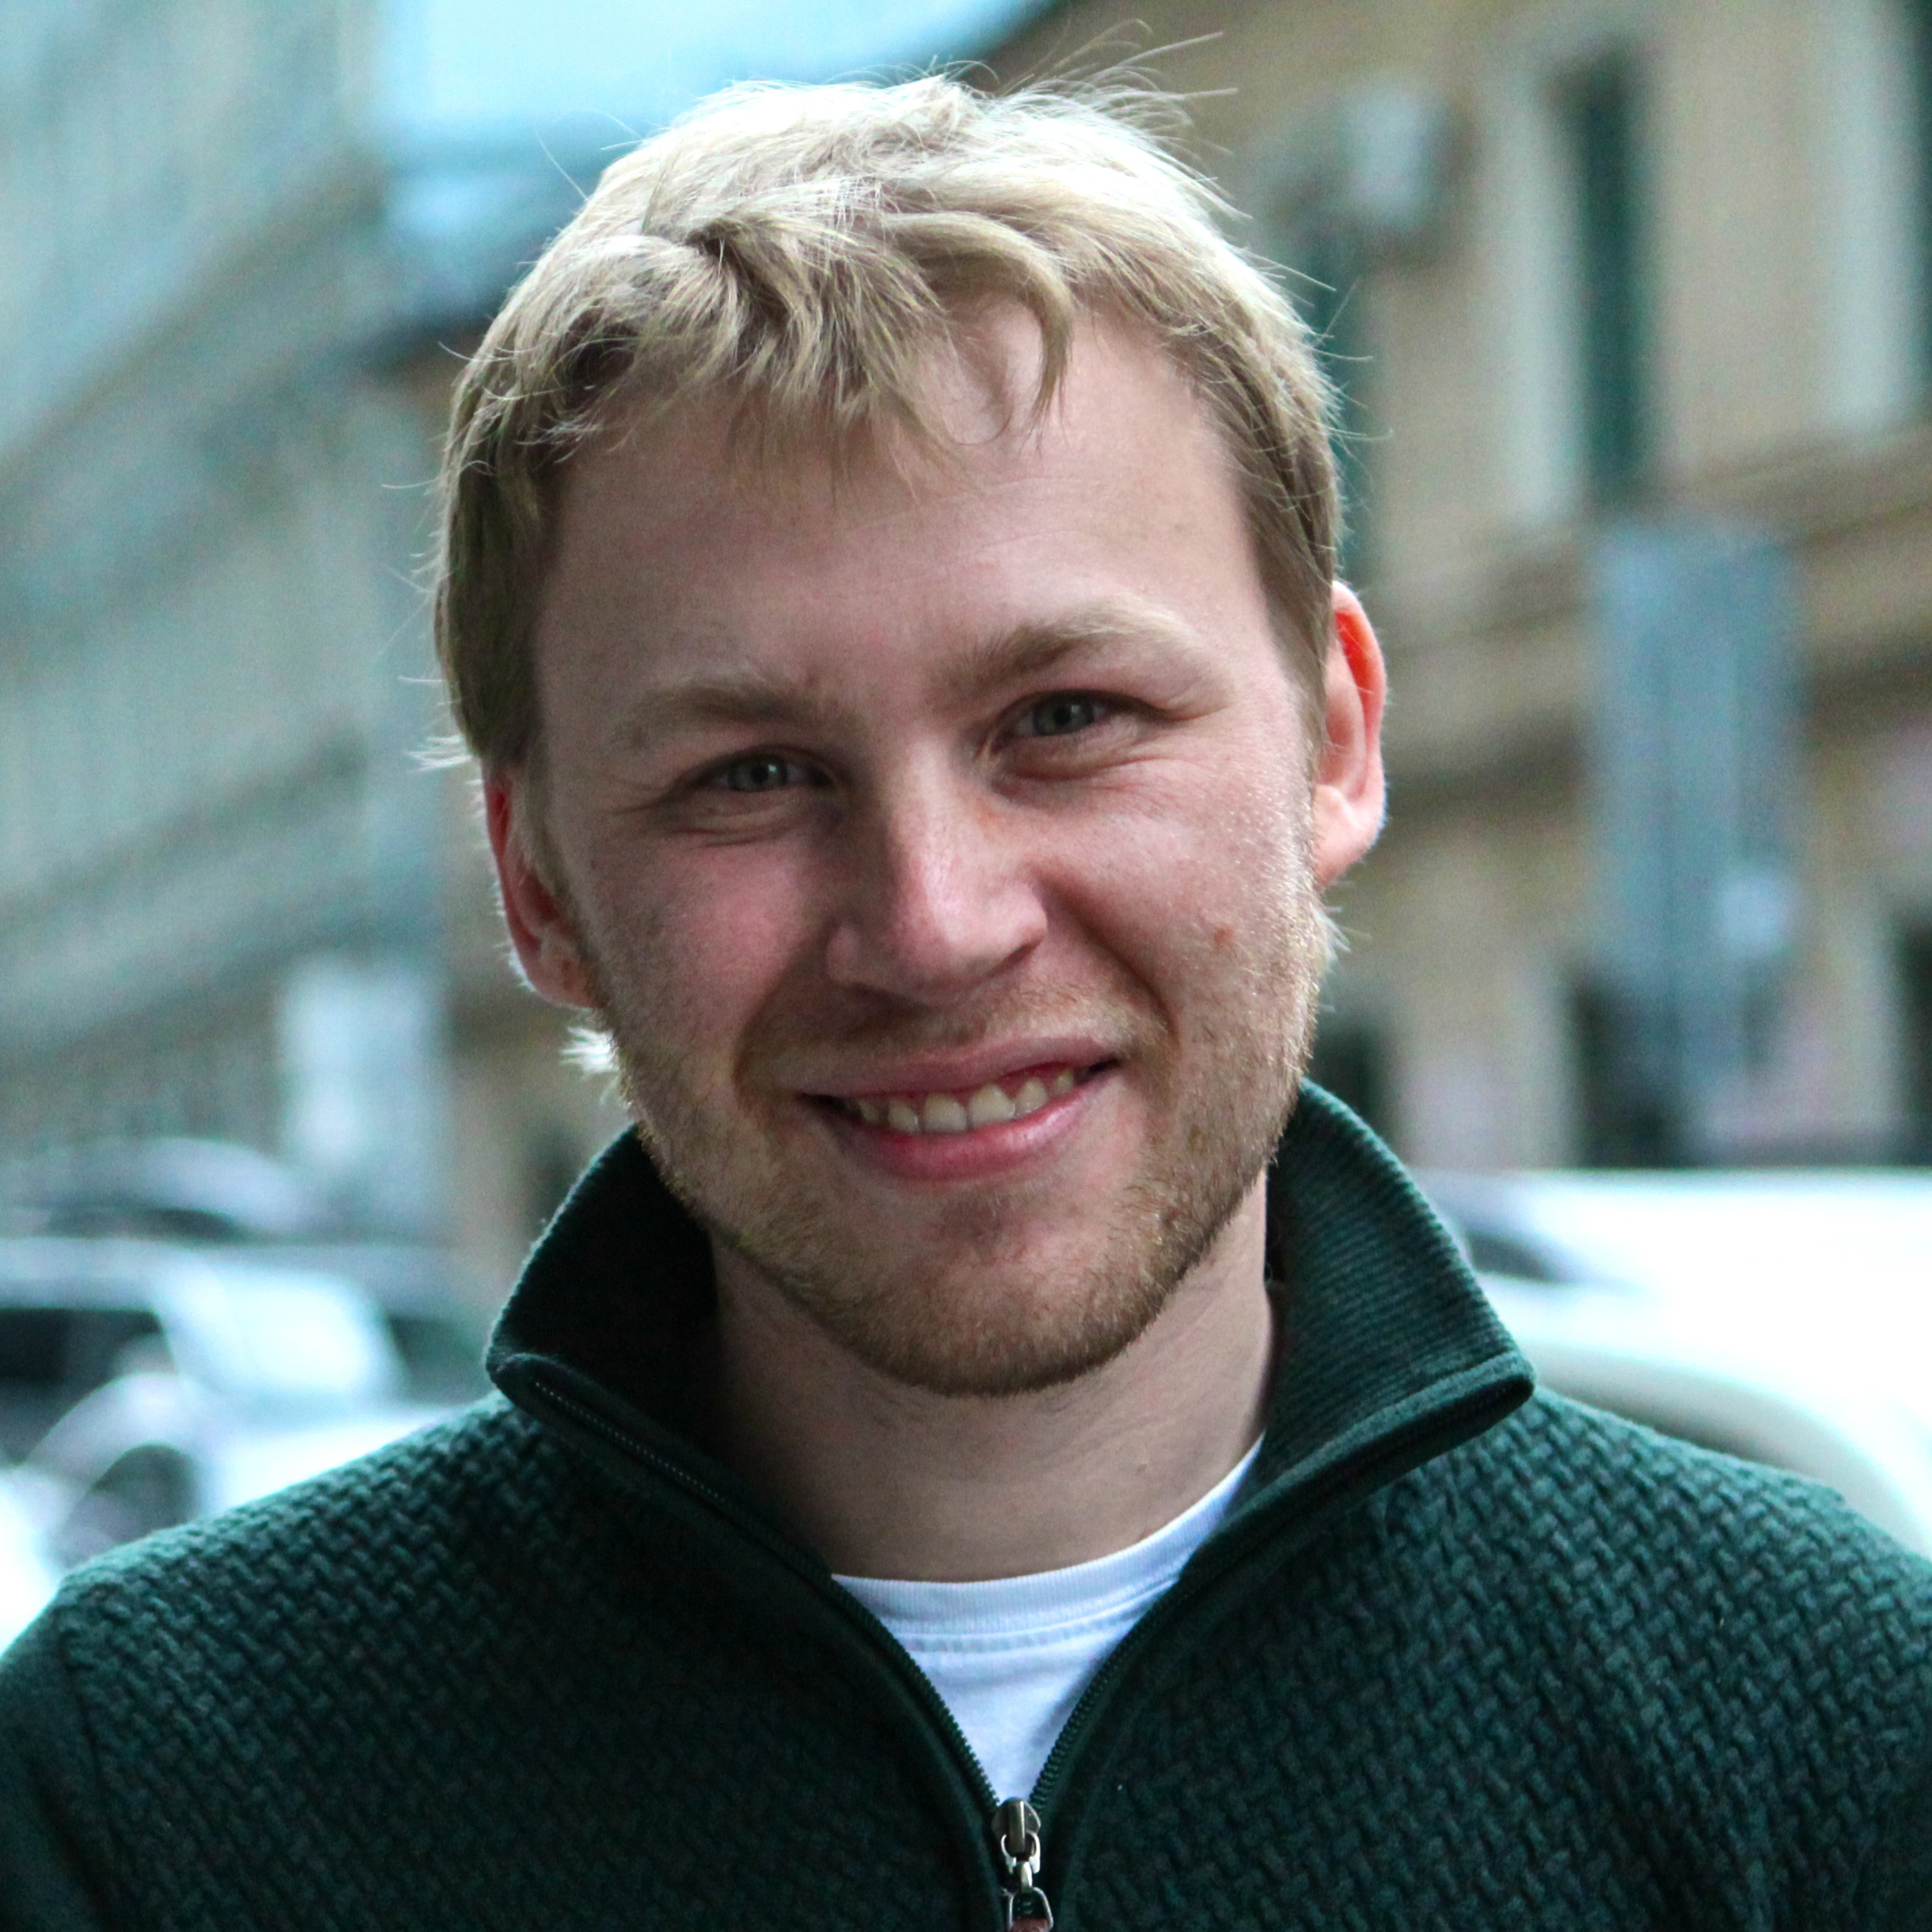 Григорий Котомин